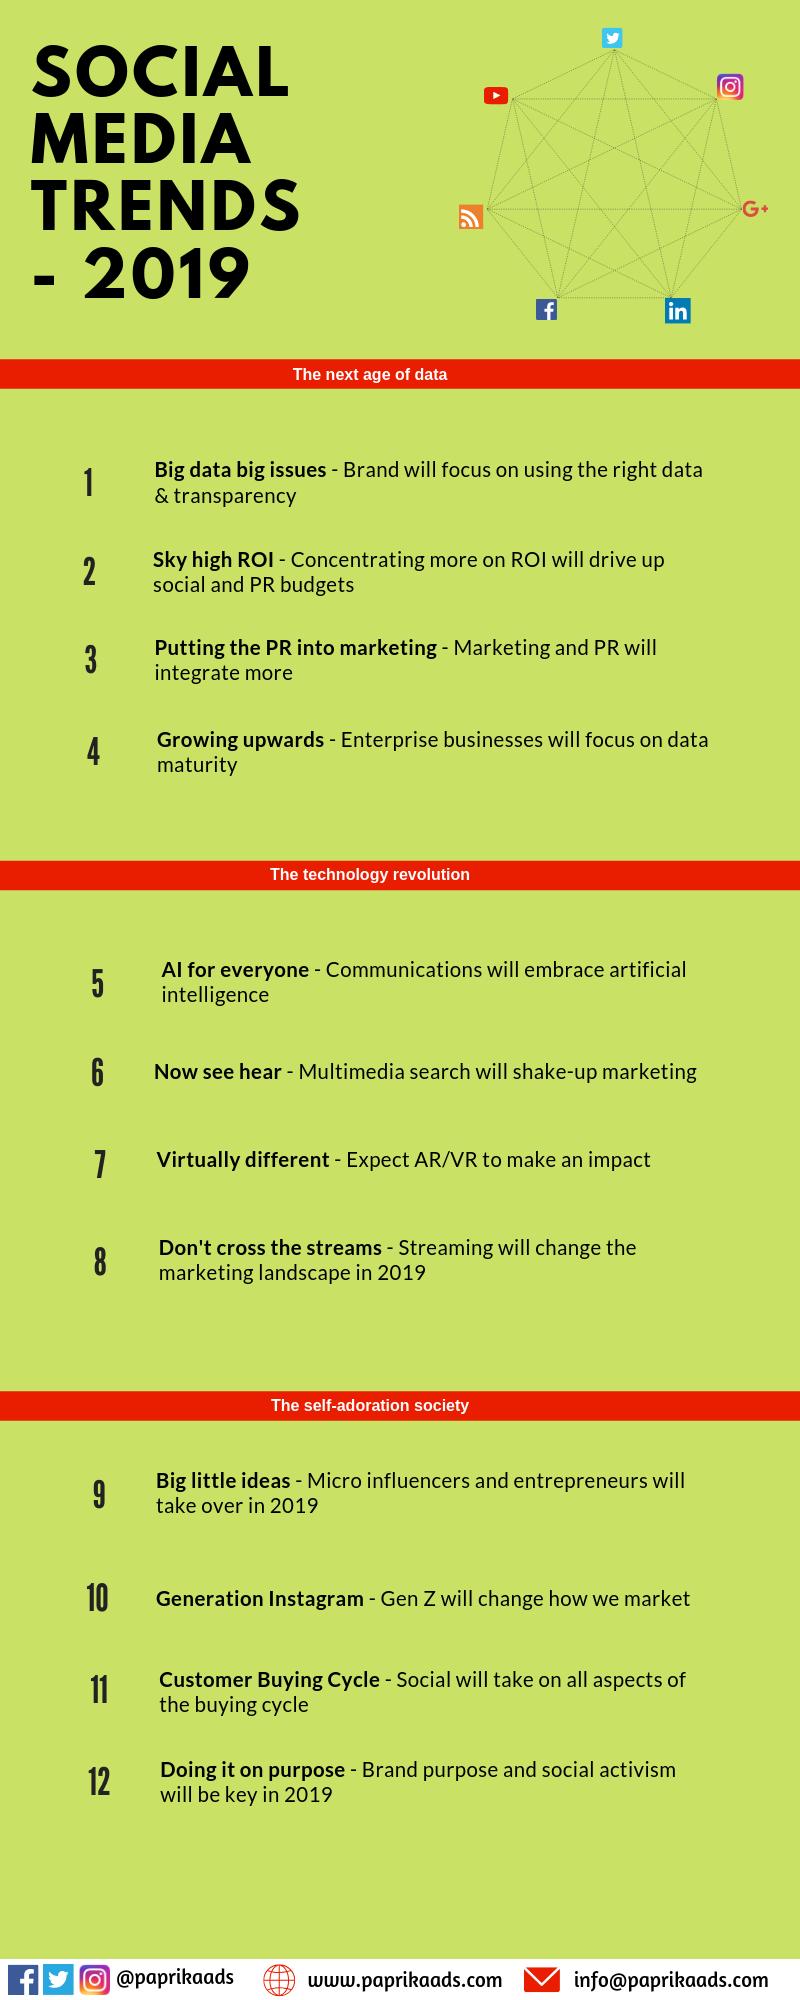 infographic social media trends 2019